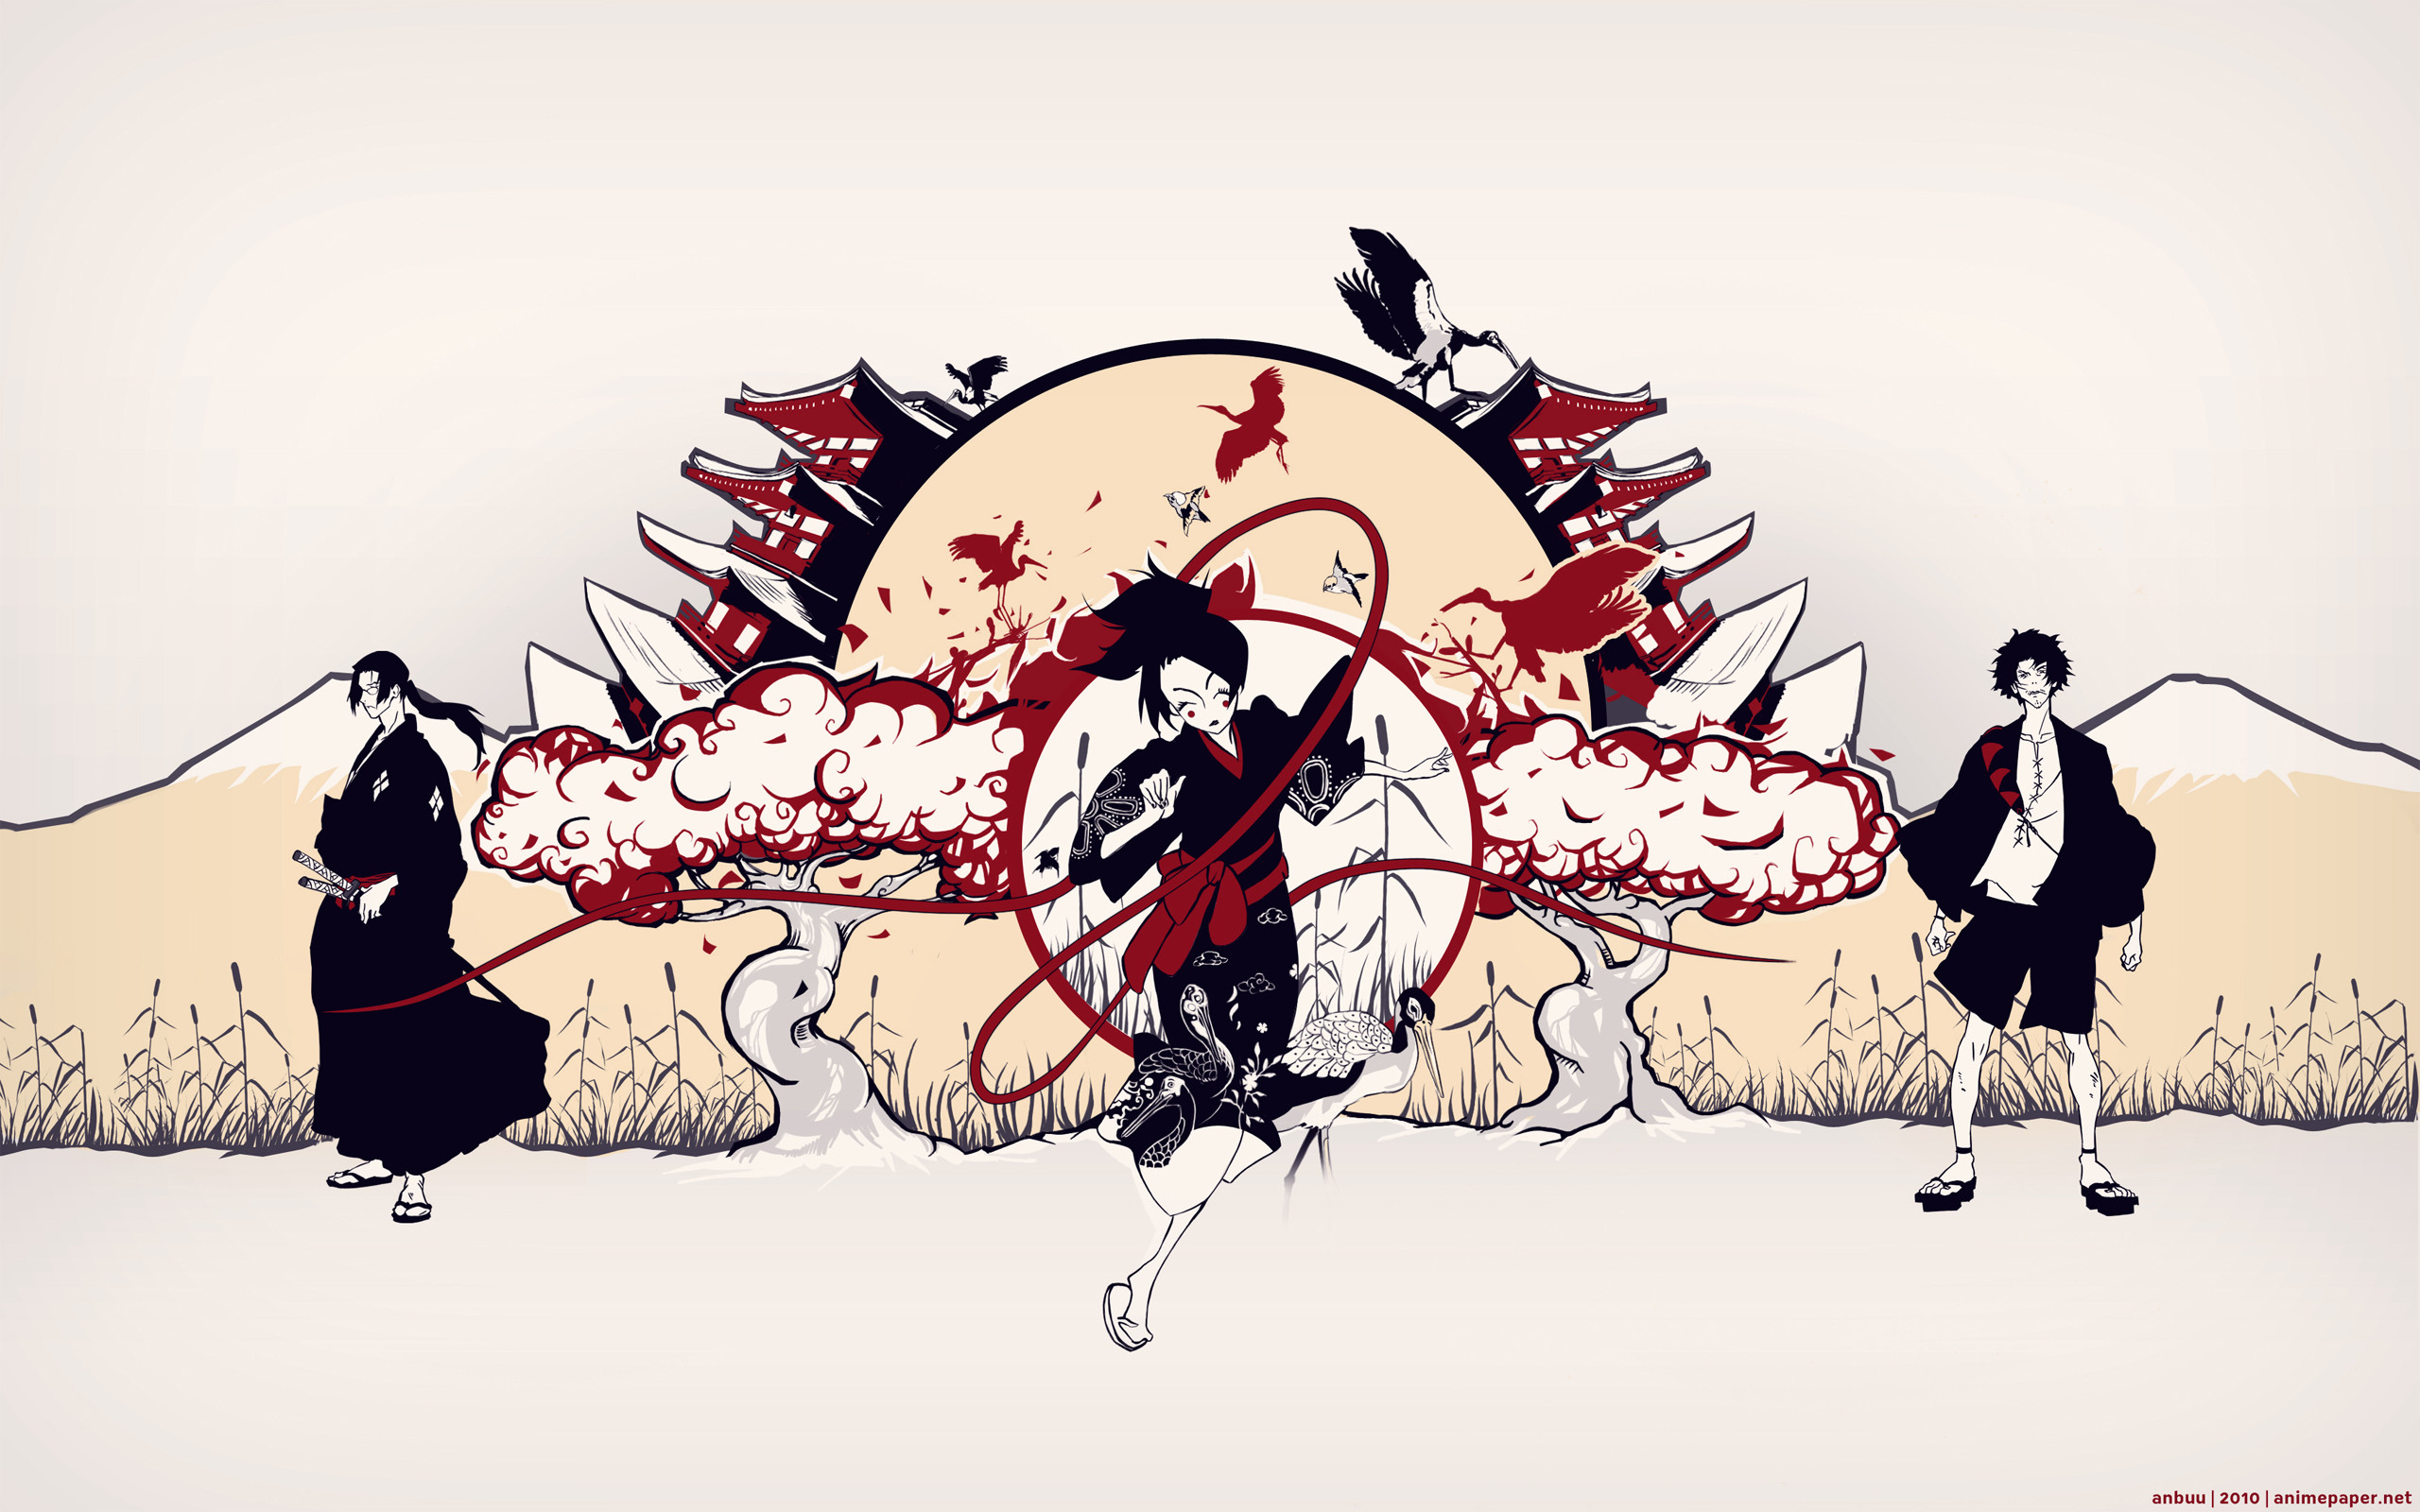 Samurai Champloo Wallpapers Samurai Champloo Wallpaper